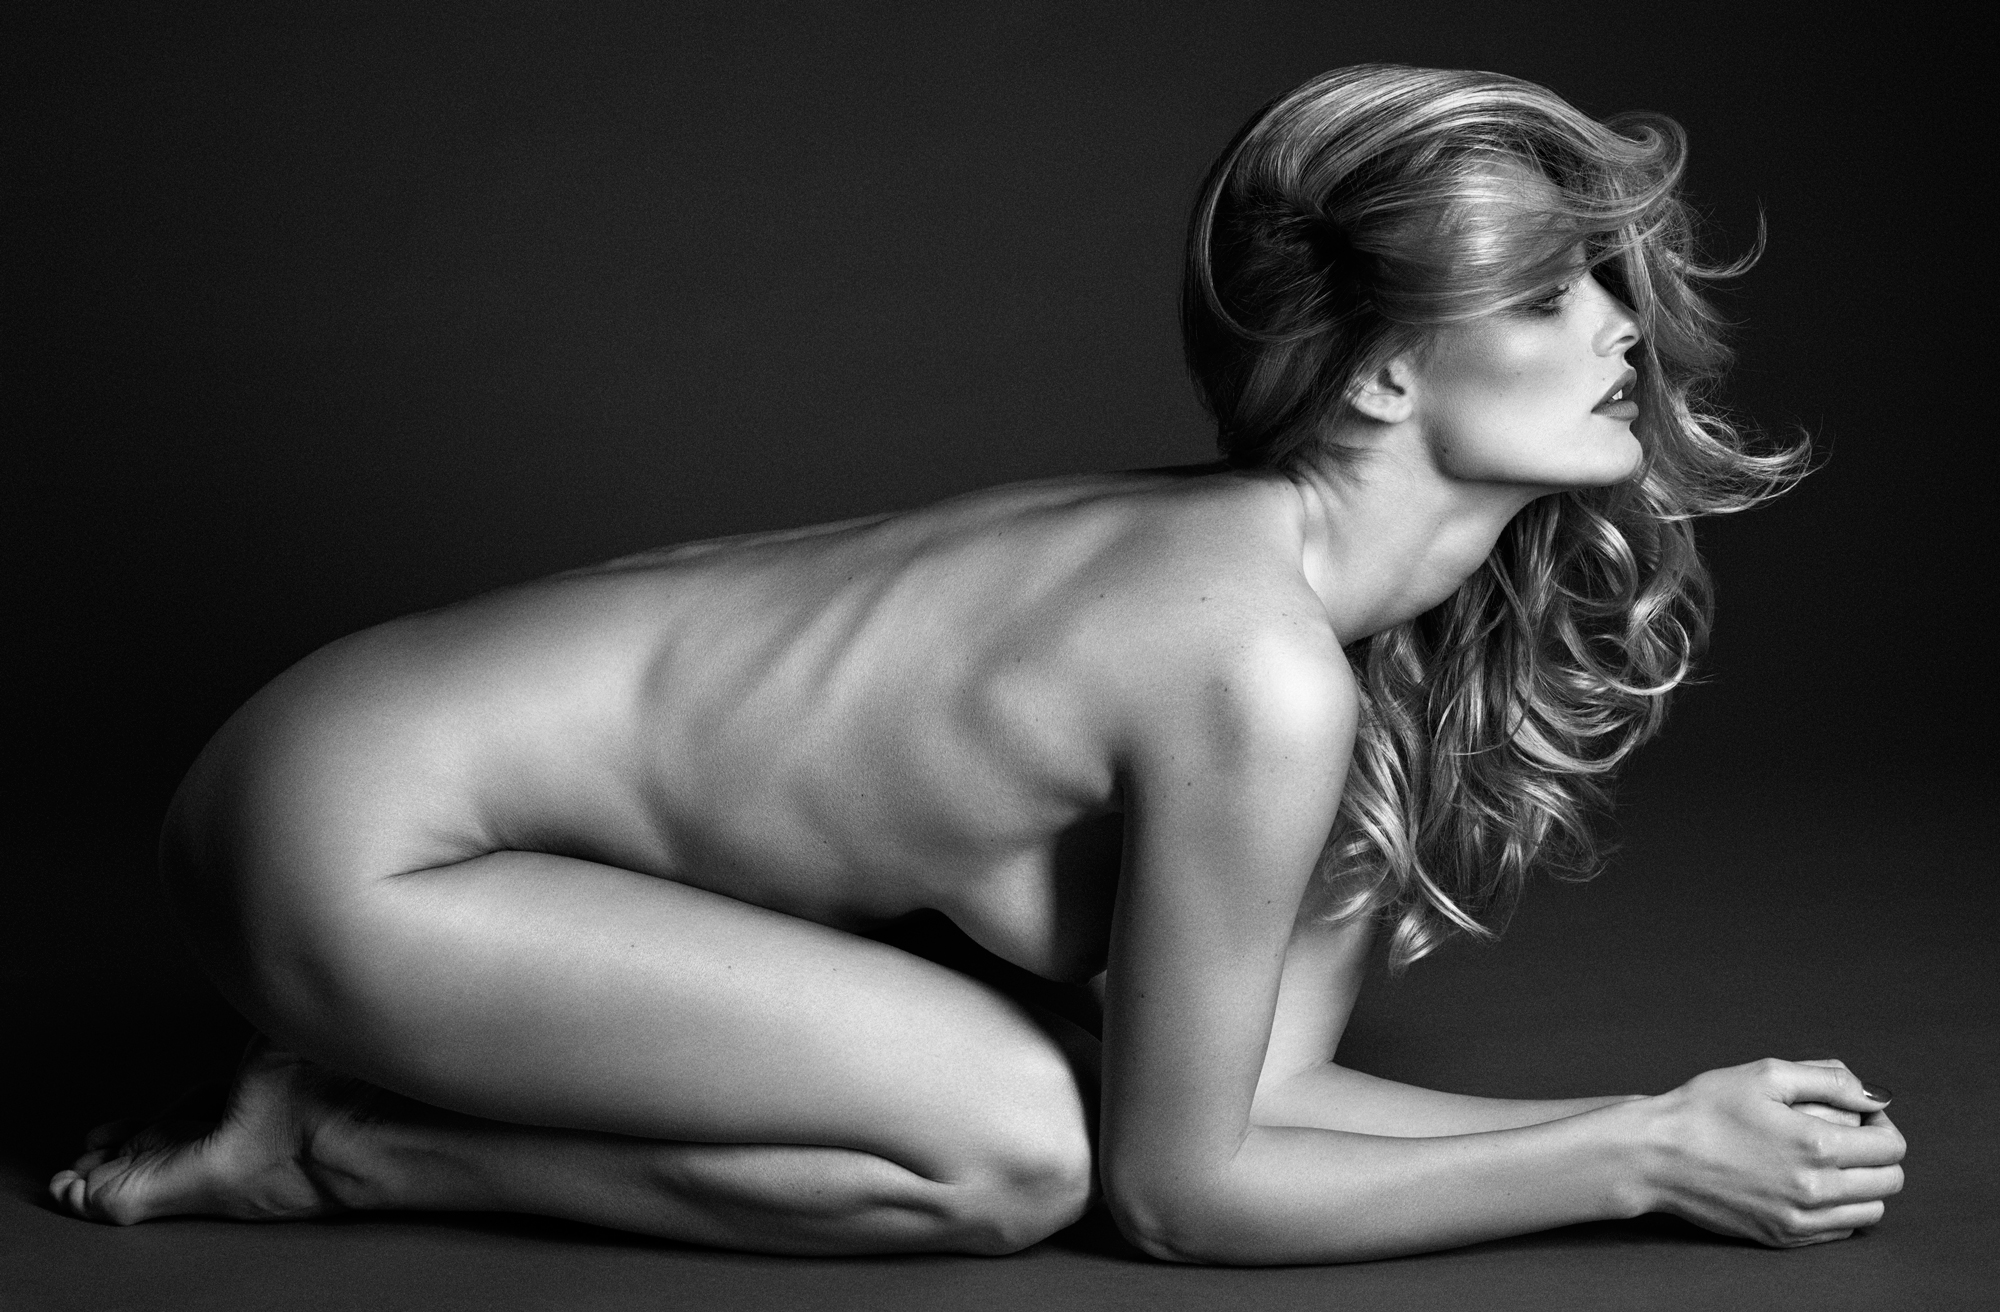 Maura murphy and angela aames nude 3